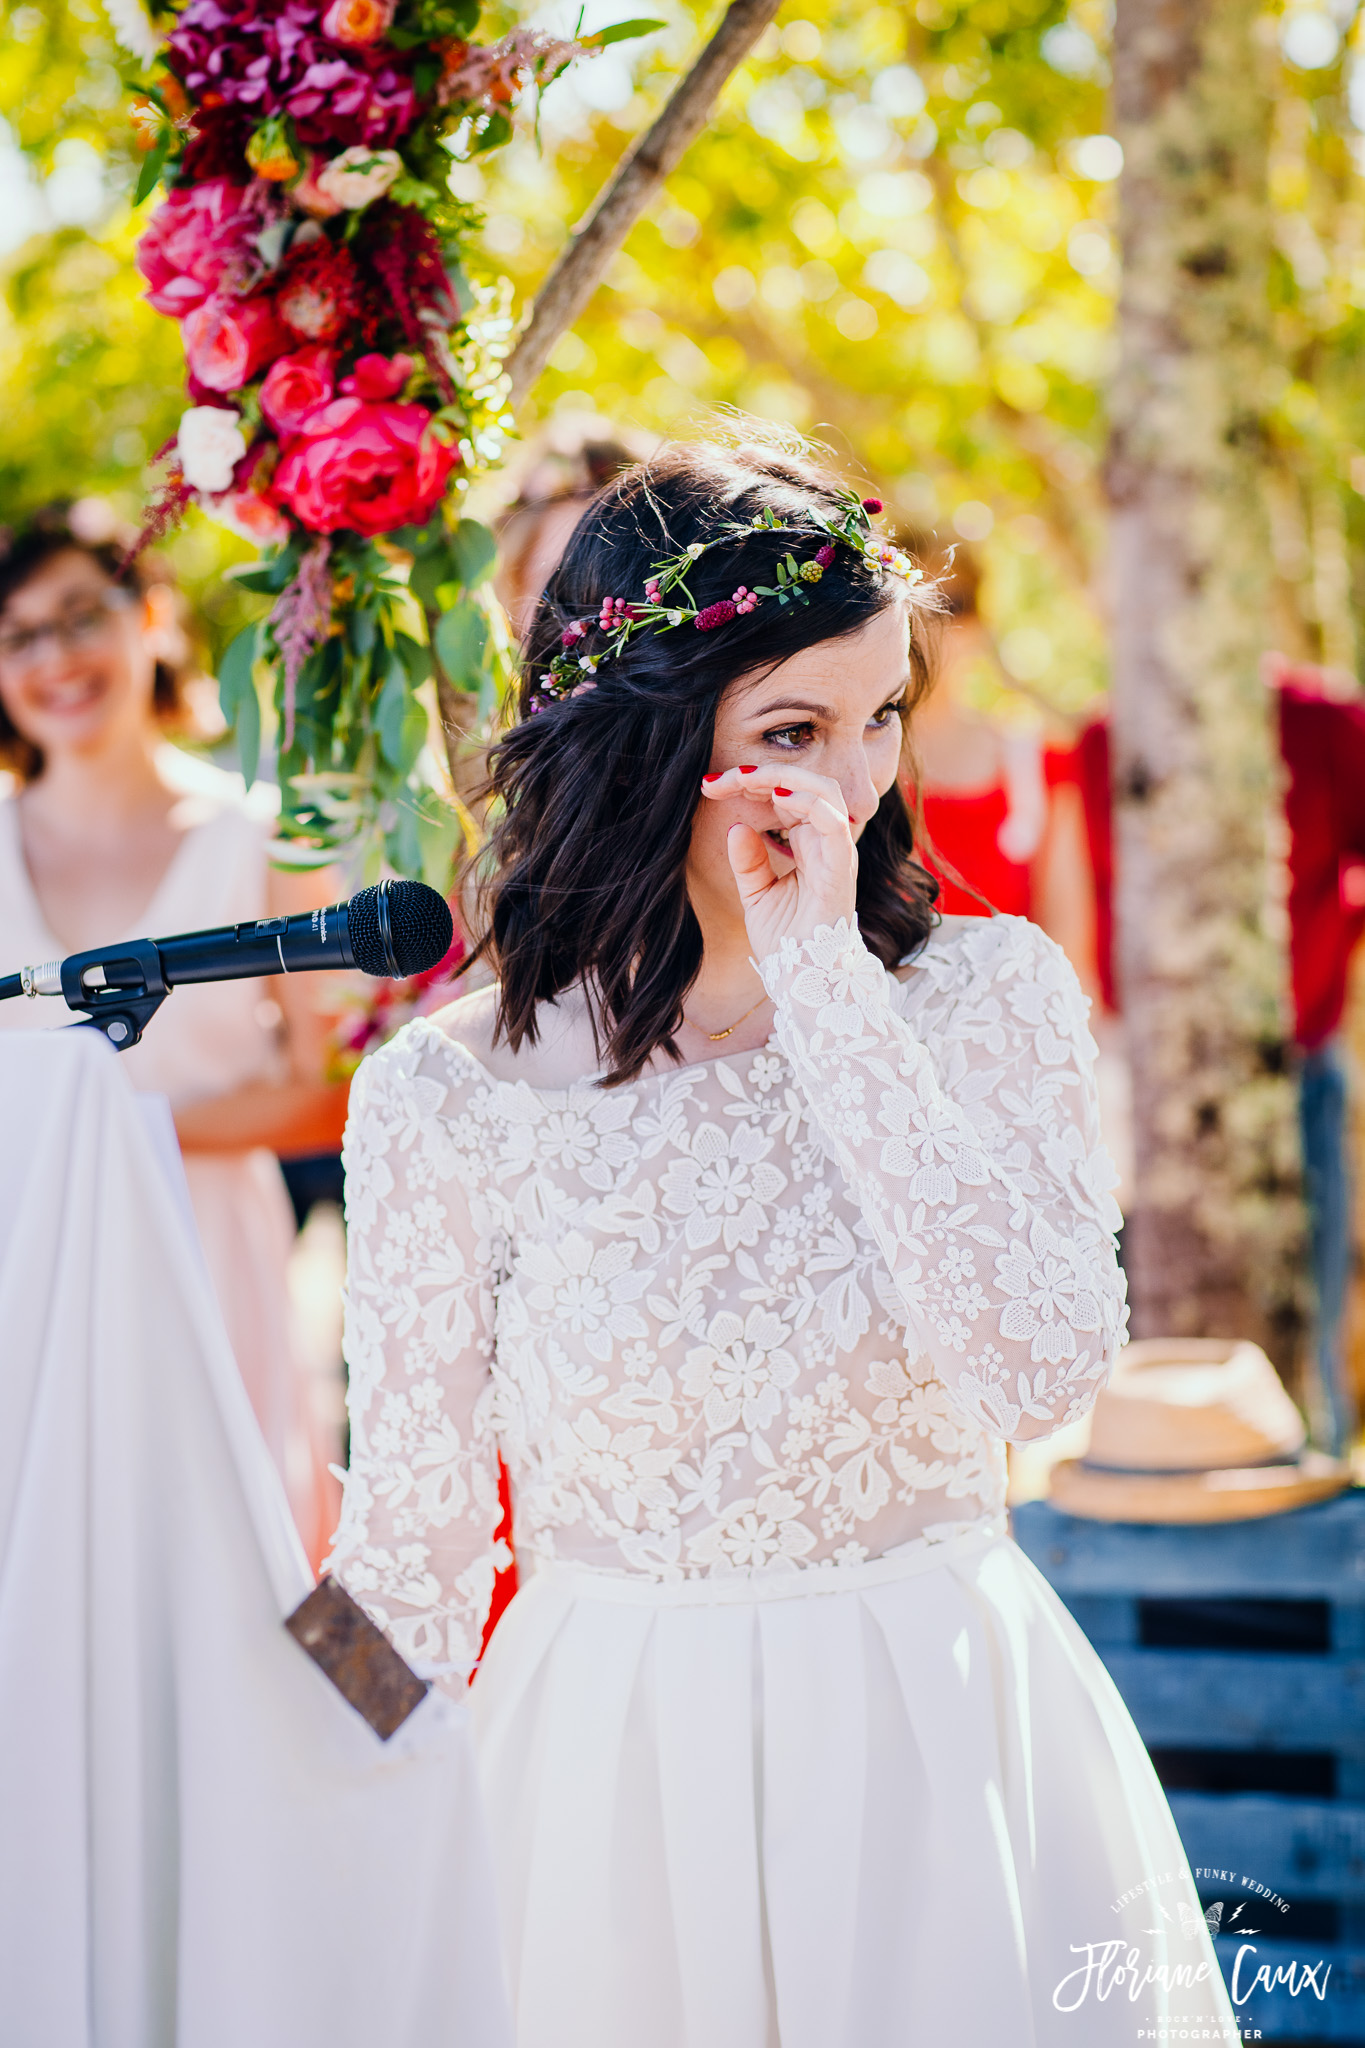 mariage-festival-cahors-ceremonie-laique-velo-licorne-5